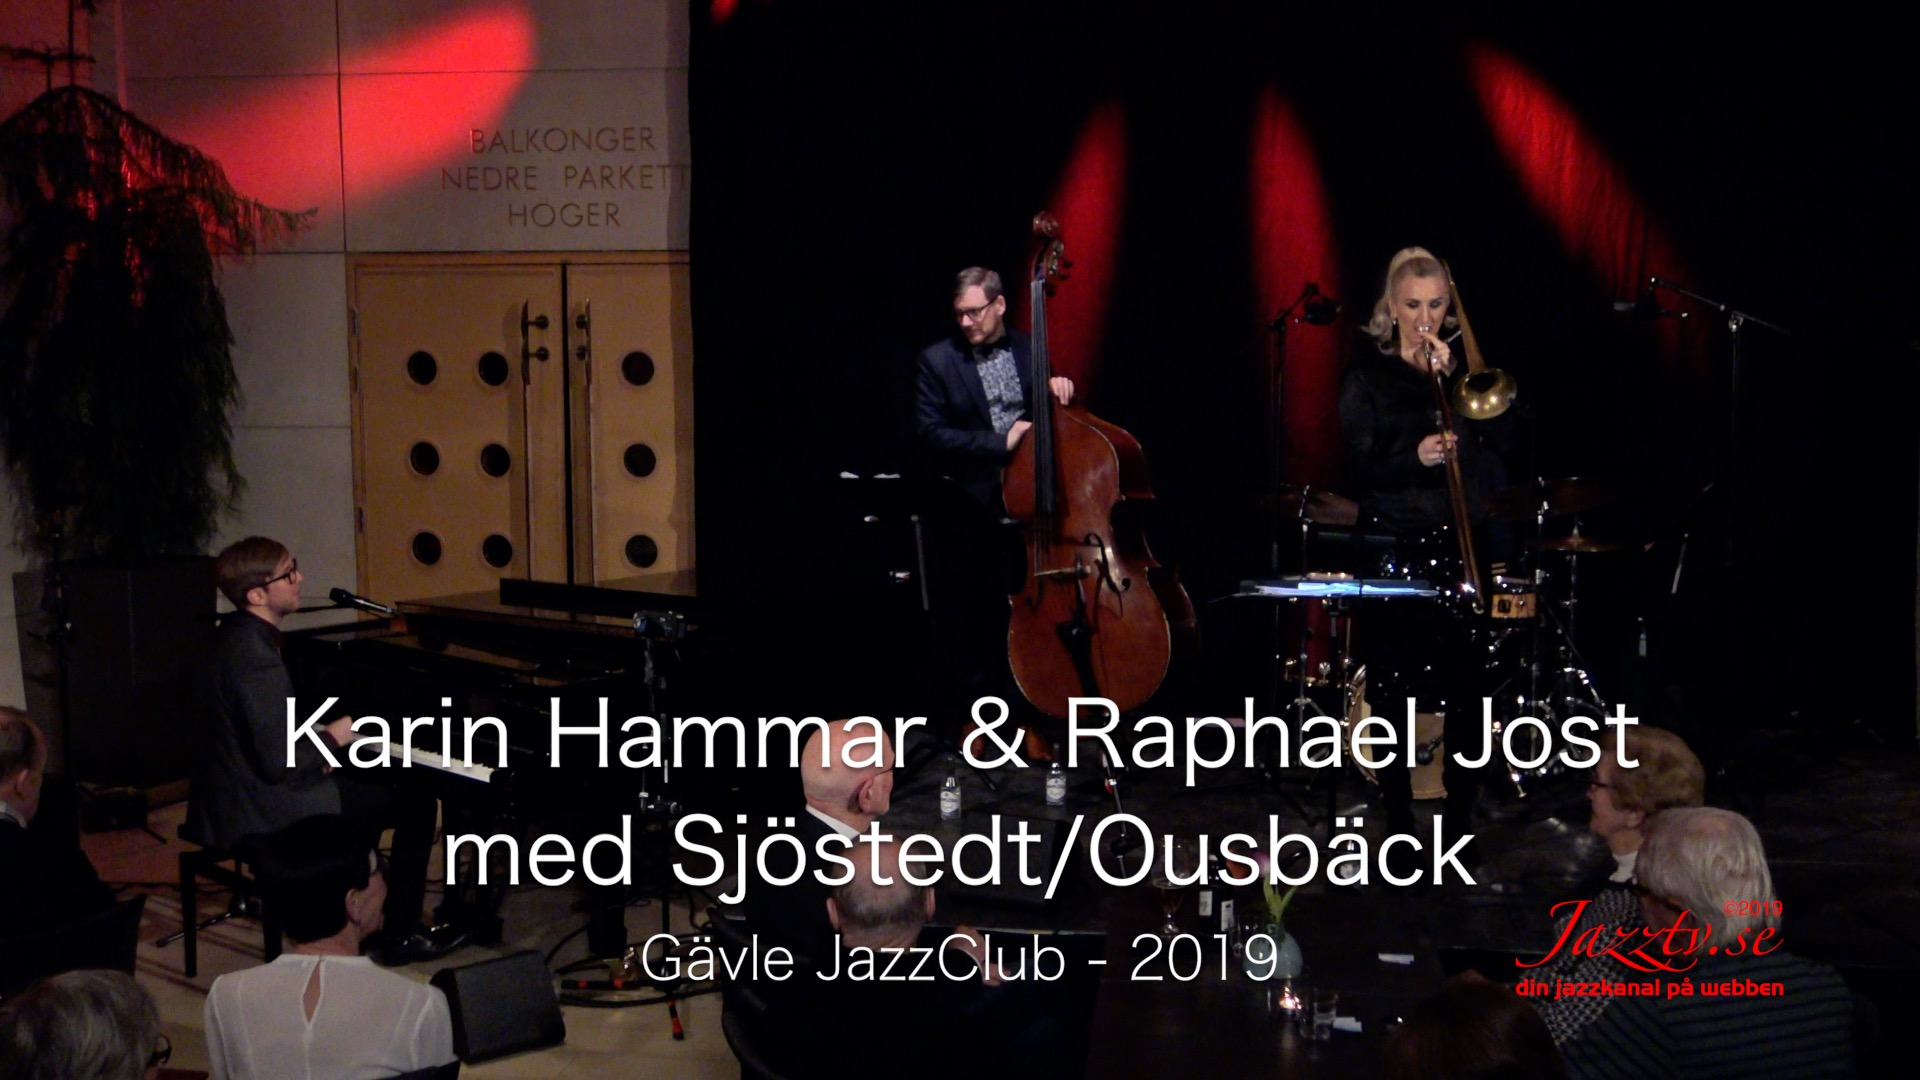 Karin Hammar & Raphael Jost with Sjöstedt/Ousbäck